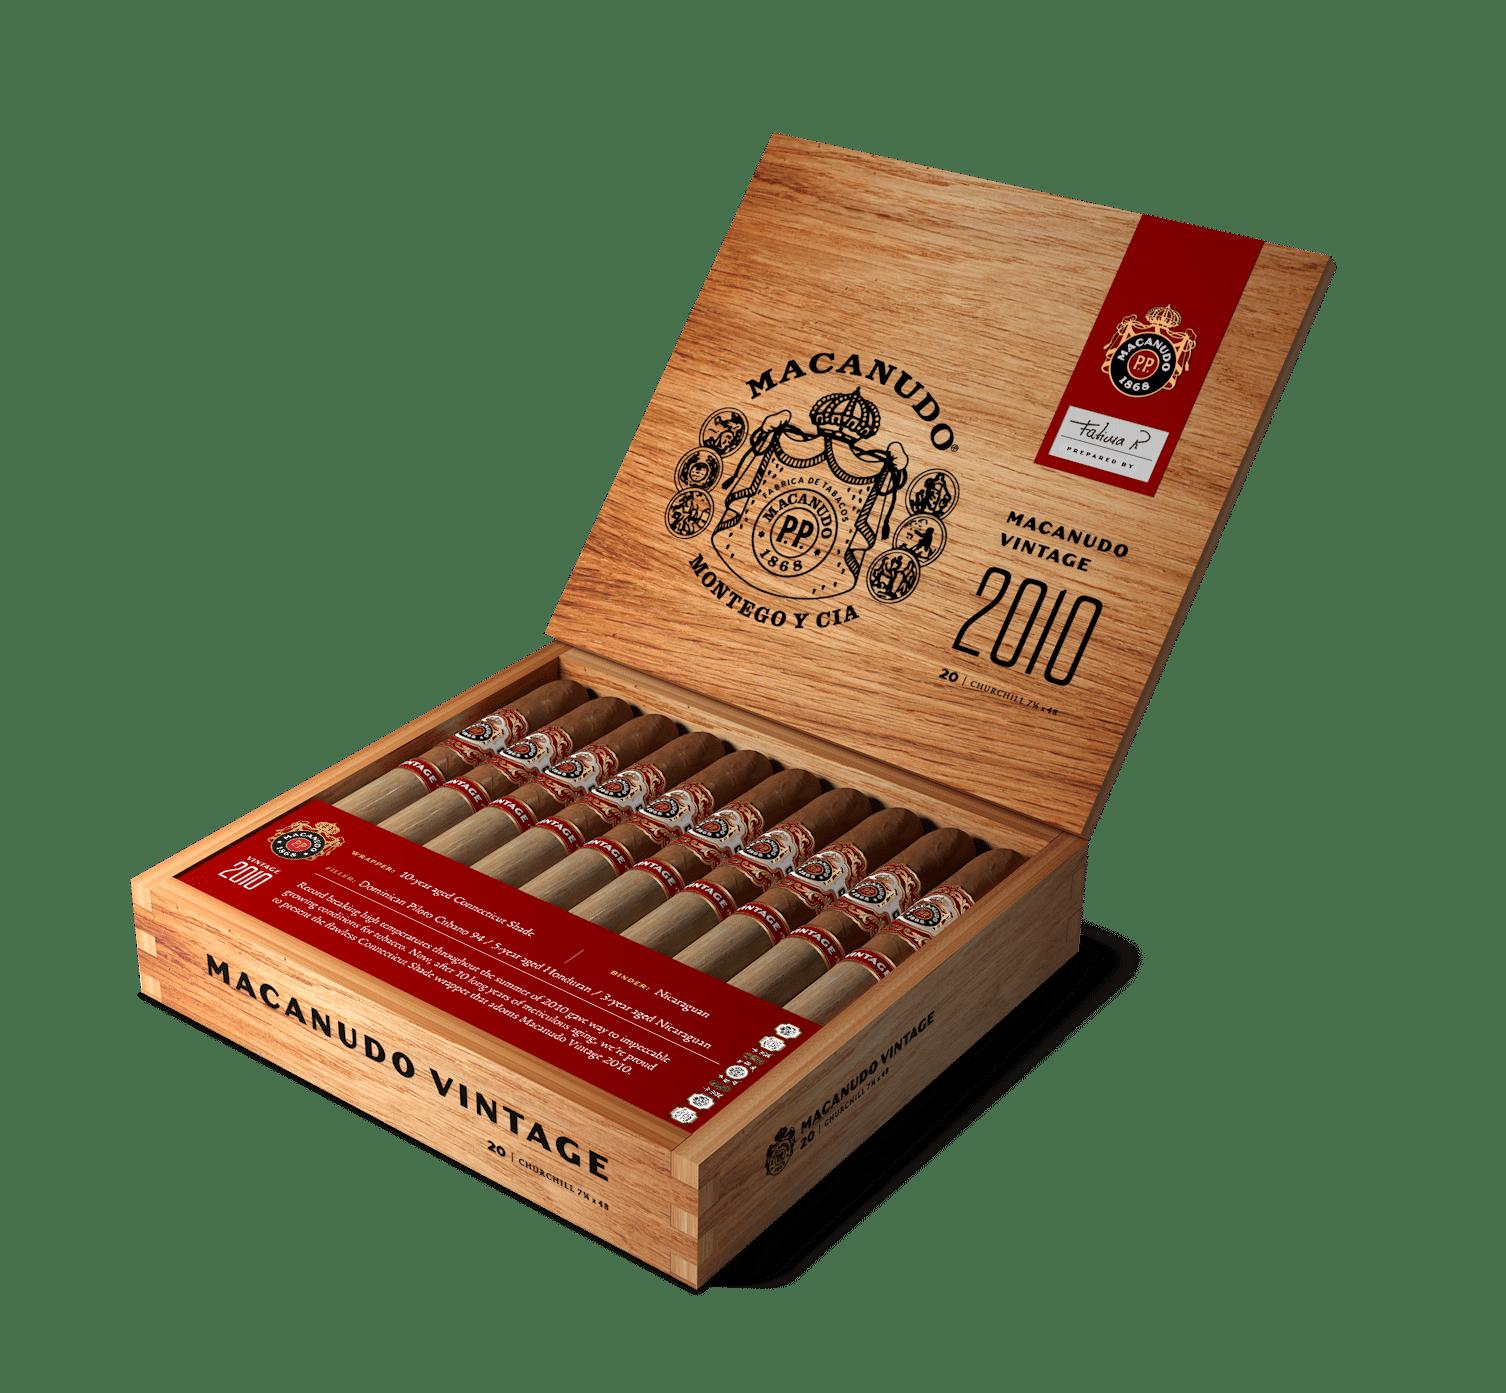 Macanudo Announces Vintage 2010 - Cigar News